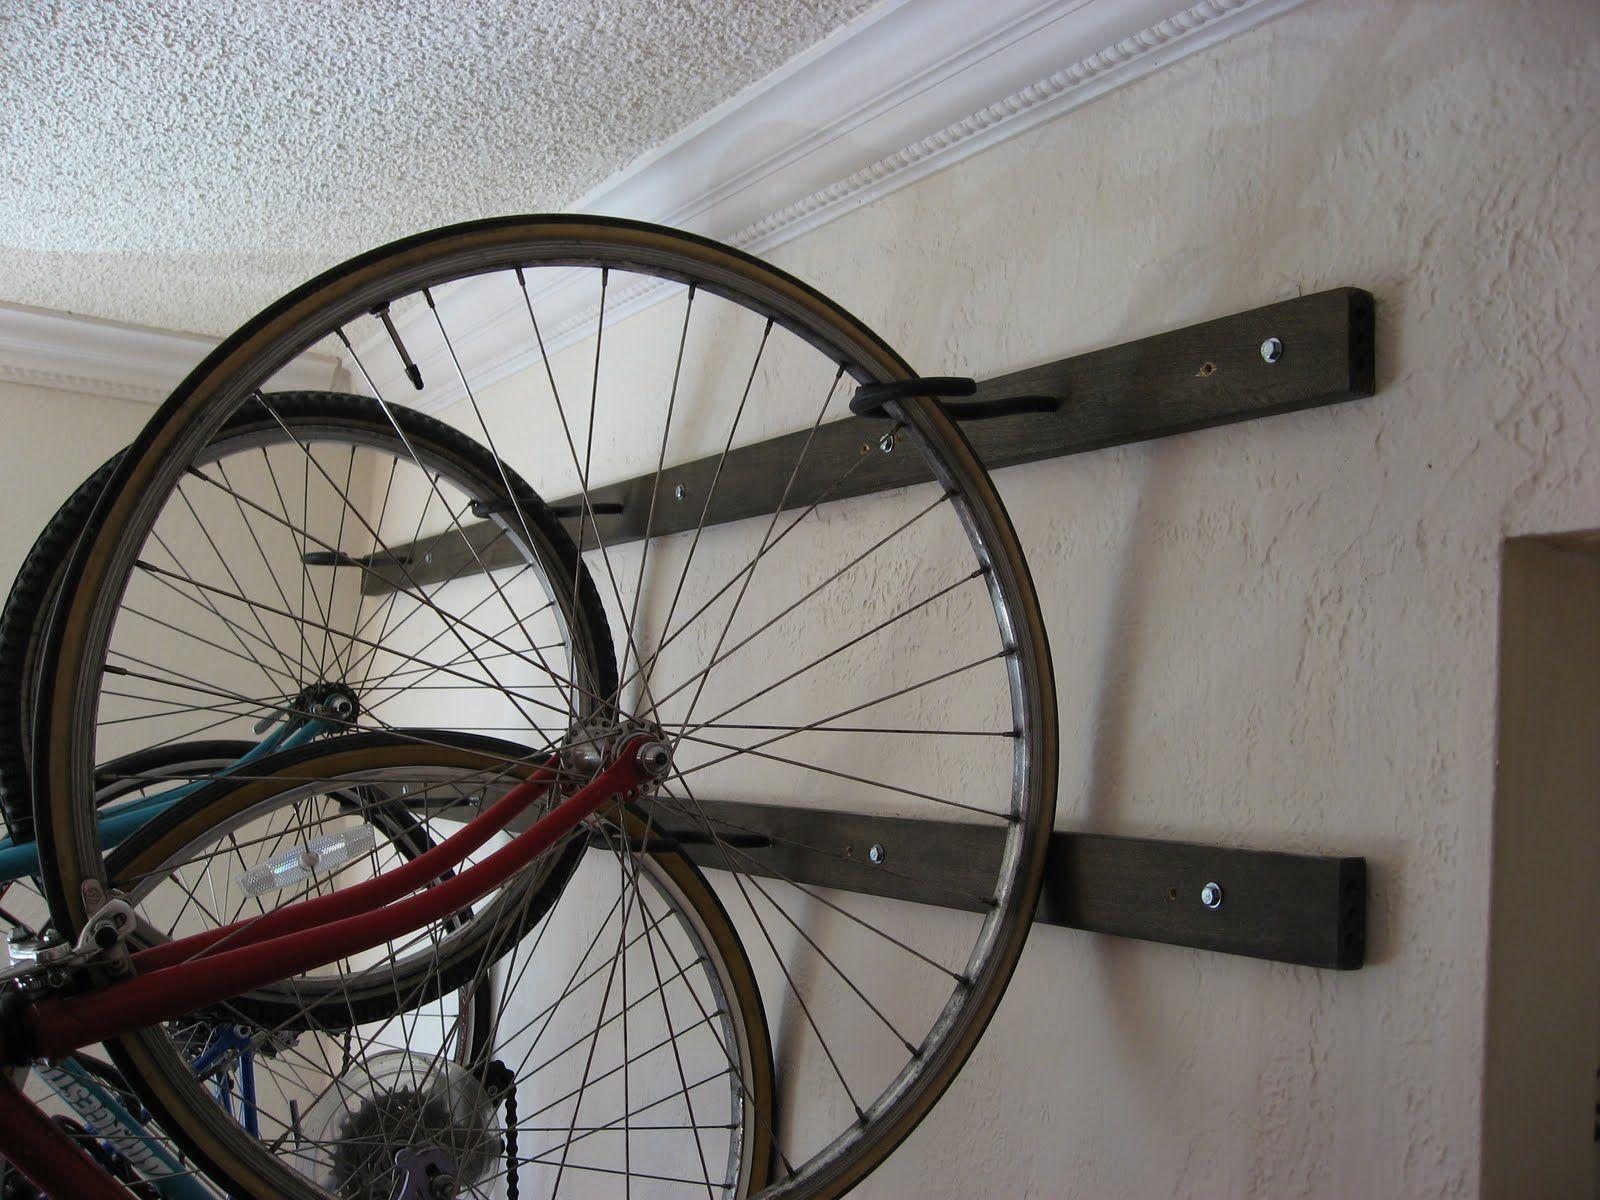 Girl On Bike Post 100 My Brand New Homemade Wall Hanging Bike Rack Hanging Bike Rack Bike Rack Wall Bike Rack